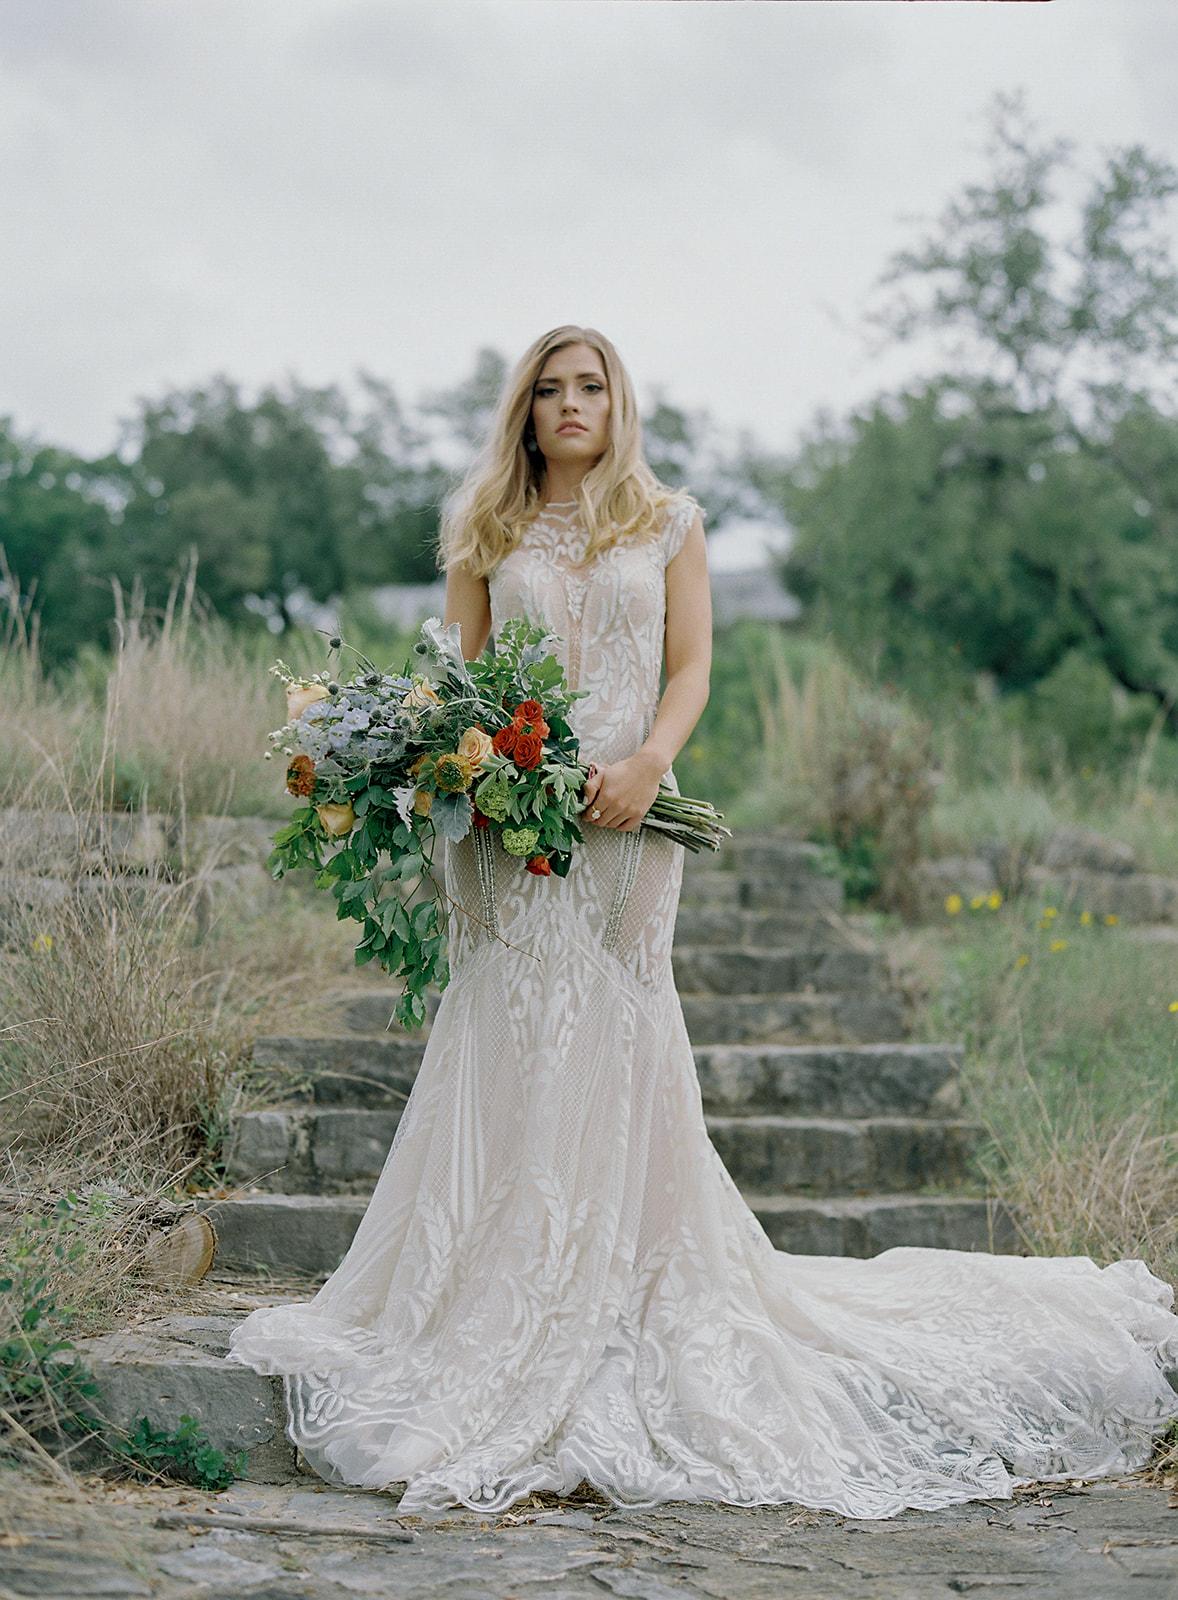 Austin_Editorial-Carrie_King_Photographer-121.jpg